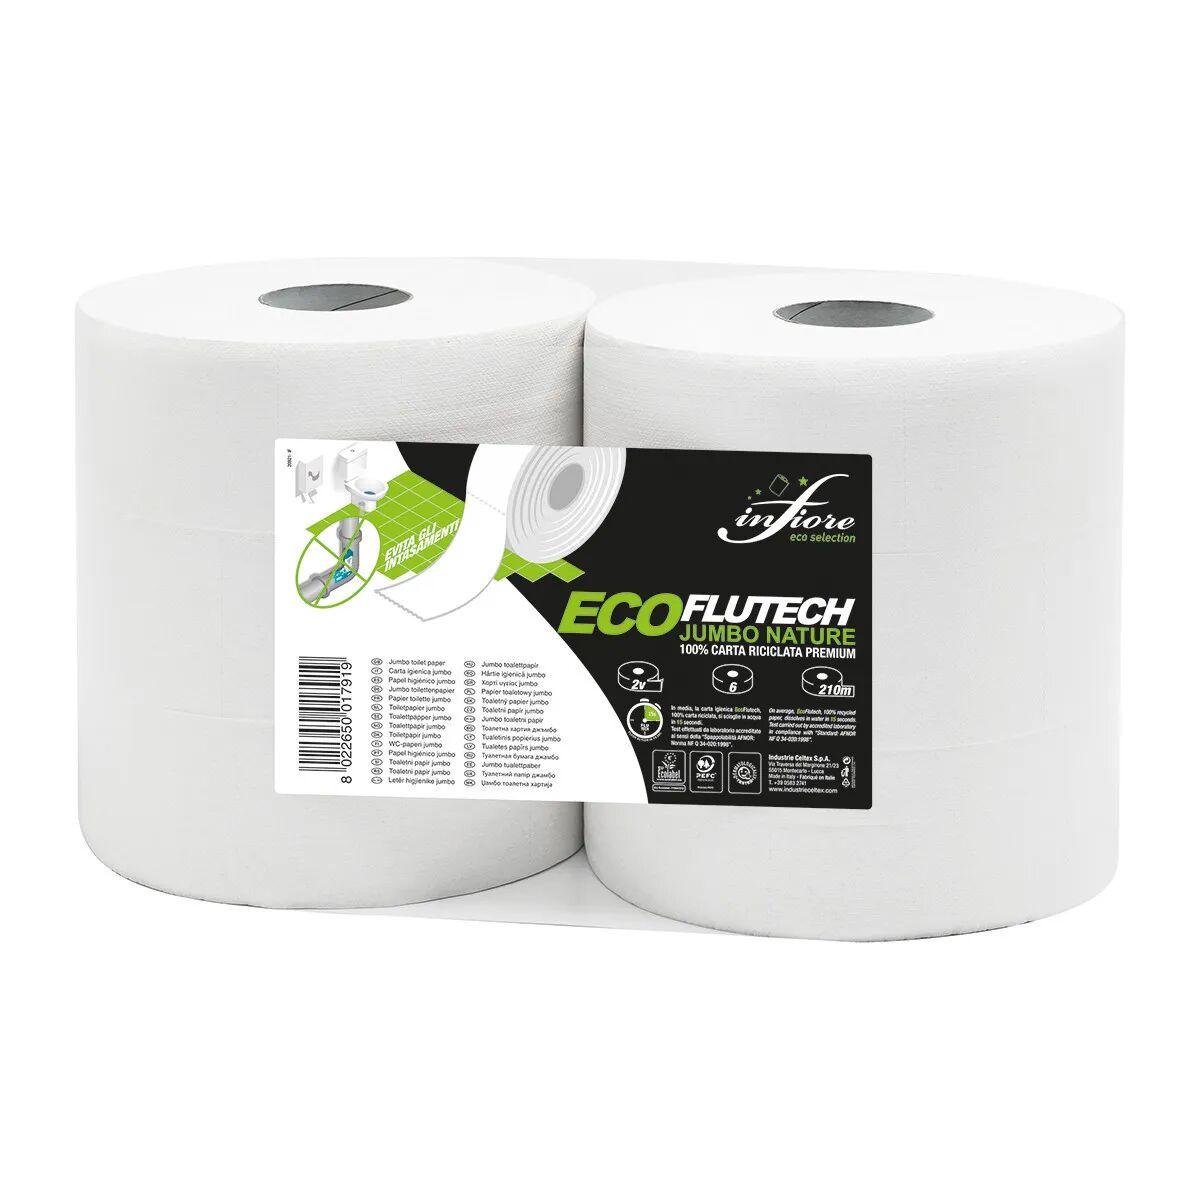 6 Rotoli Carta Igienica Jumbo Idrosolub In 15 Secondi 210m X 9,2 Cm 2 Veli Cellulosa Ecologica